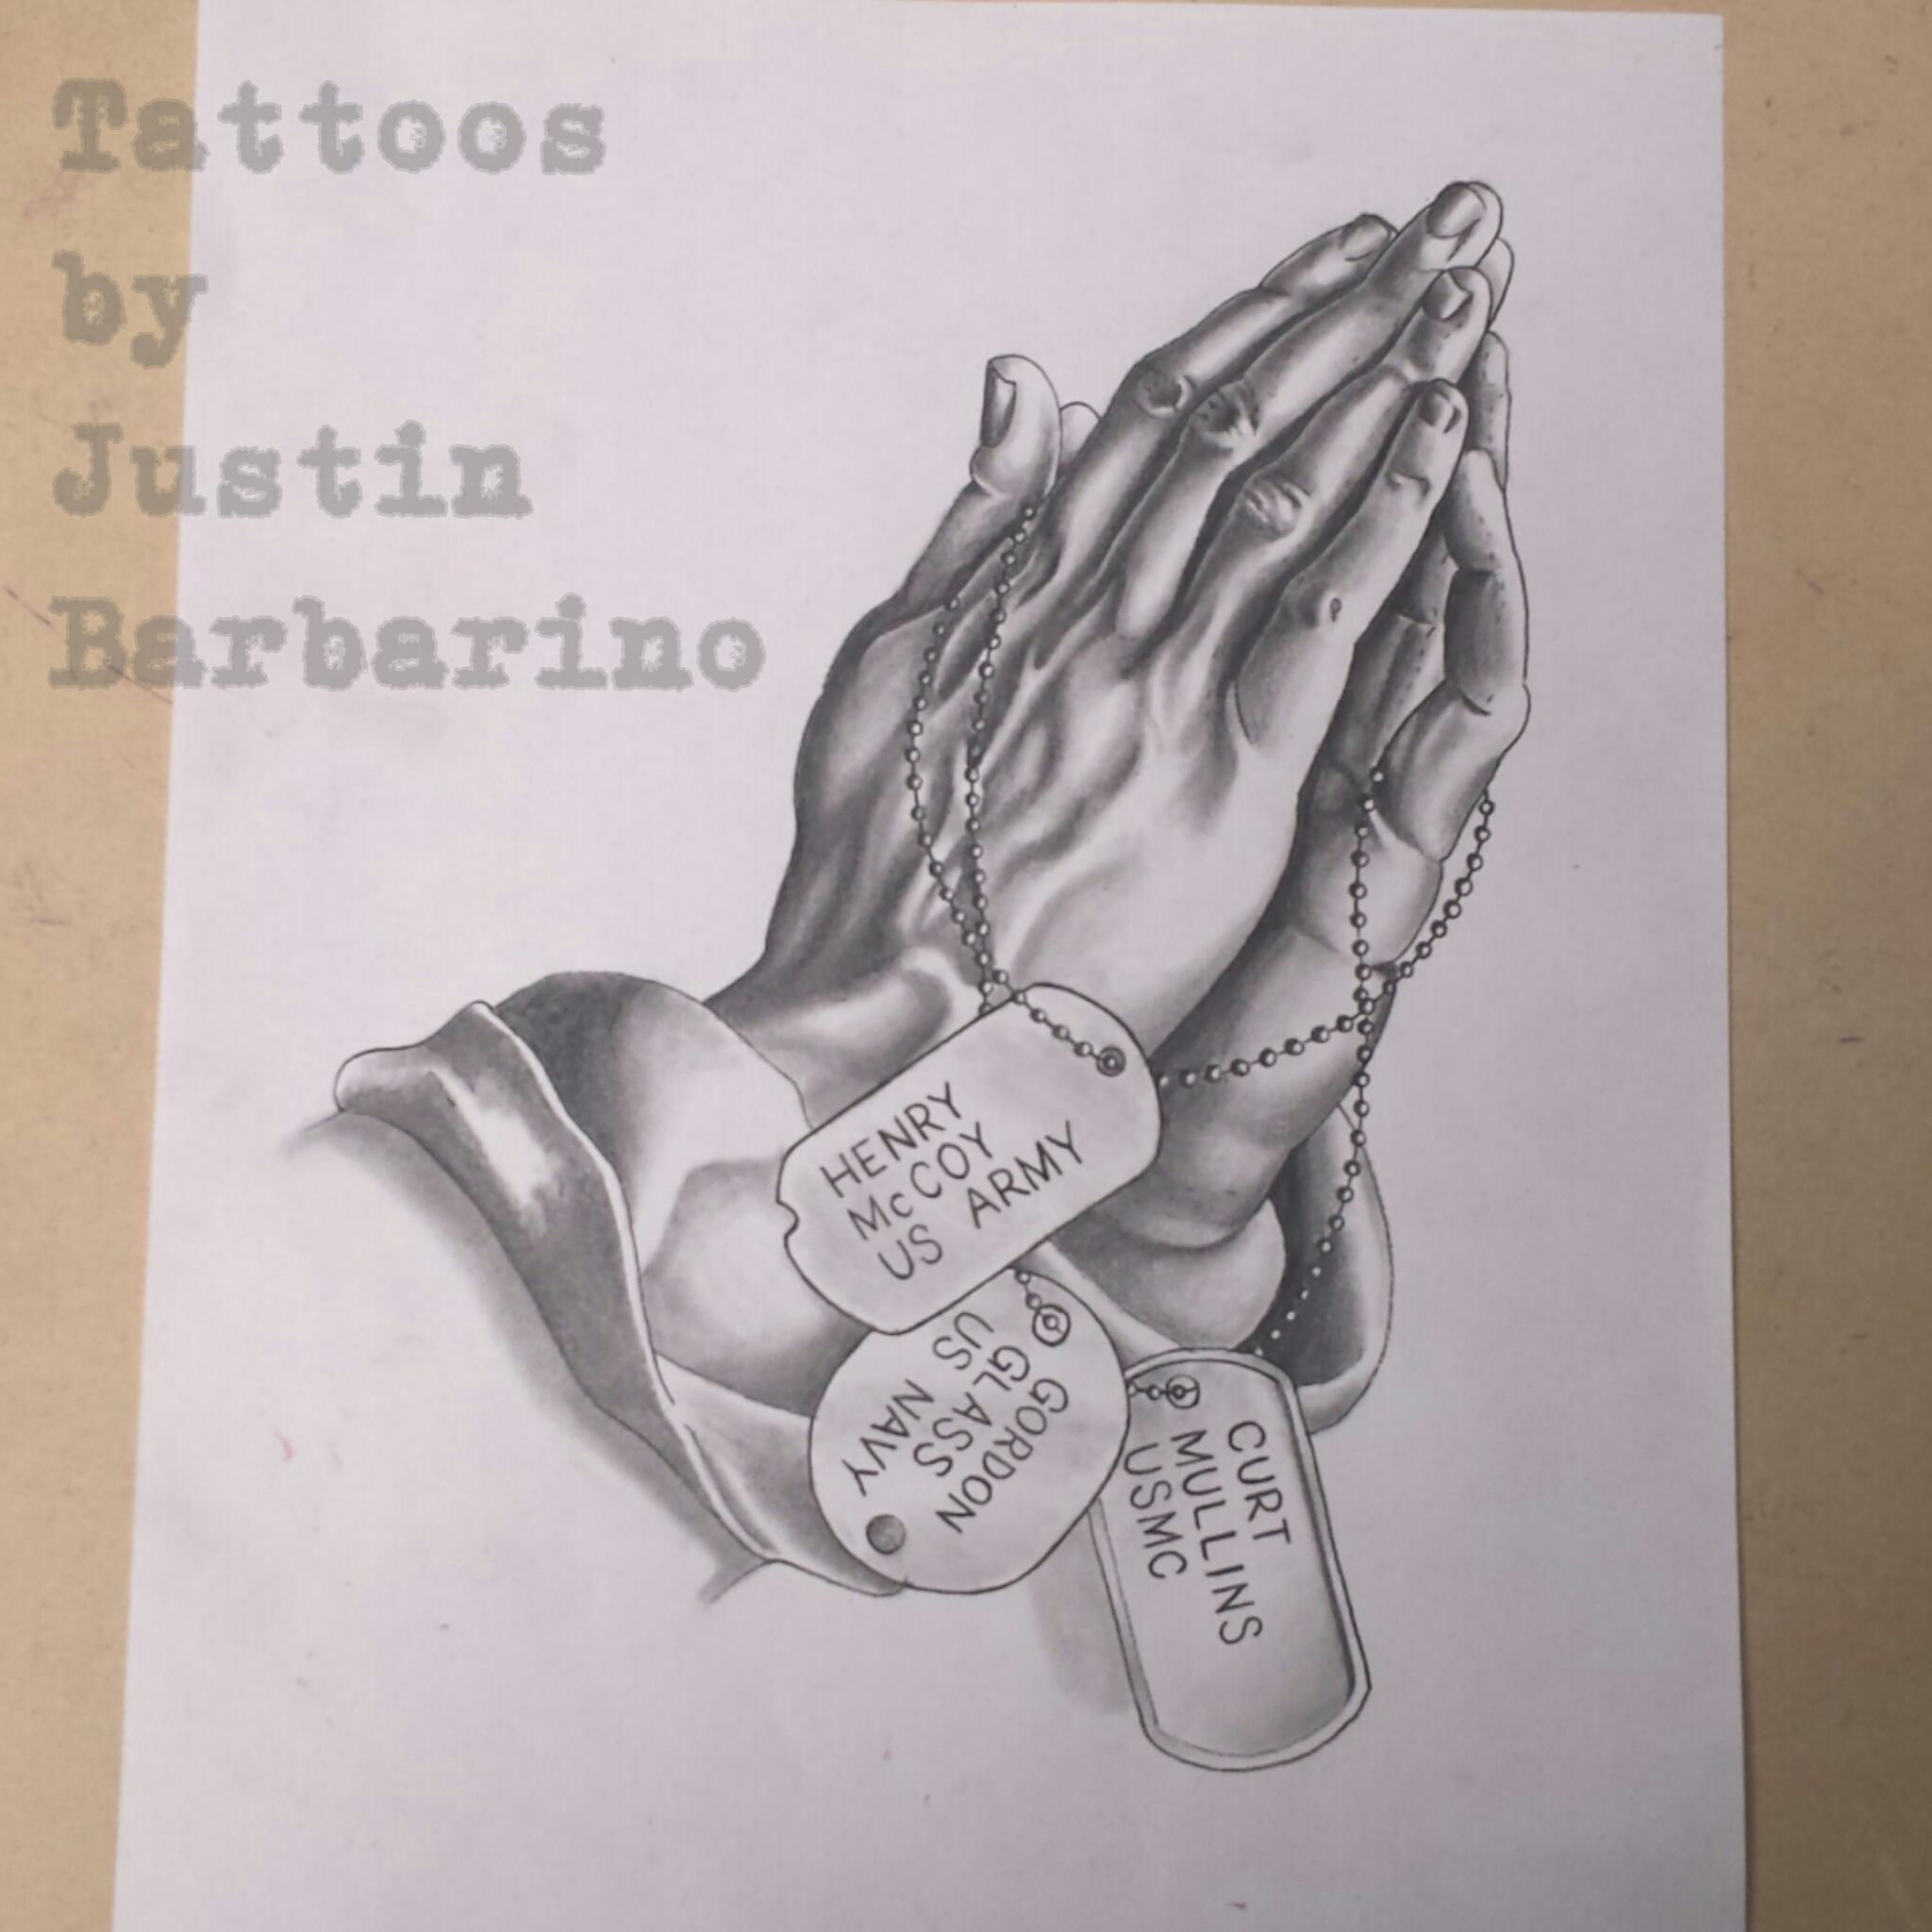 2048x2048 Skull Tattoos By Justin Babs Barbarino